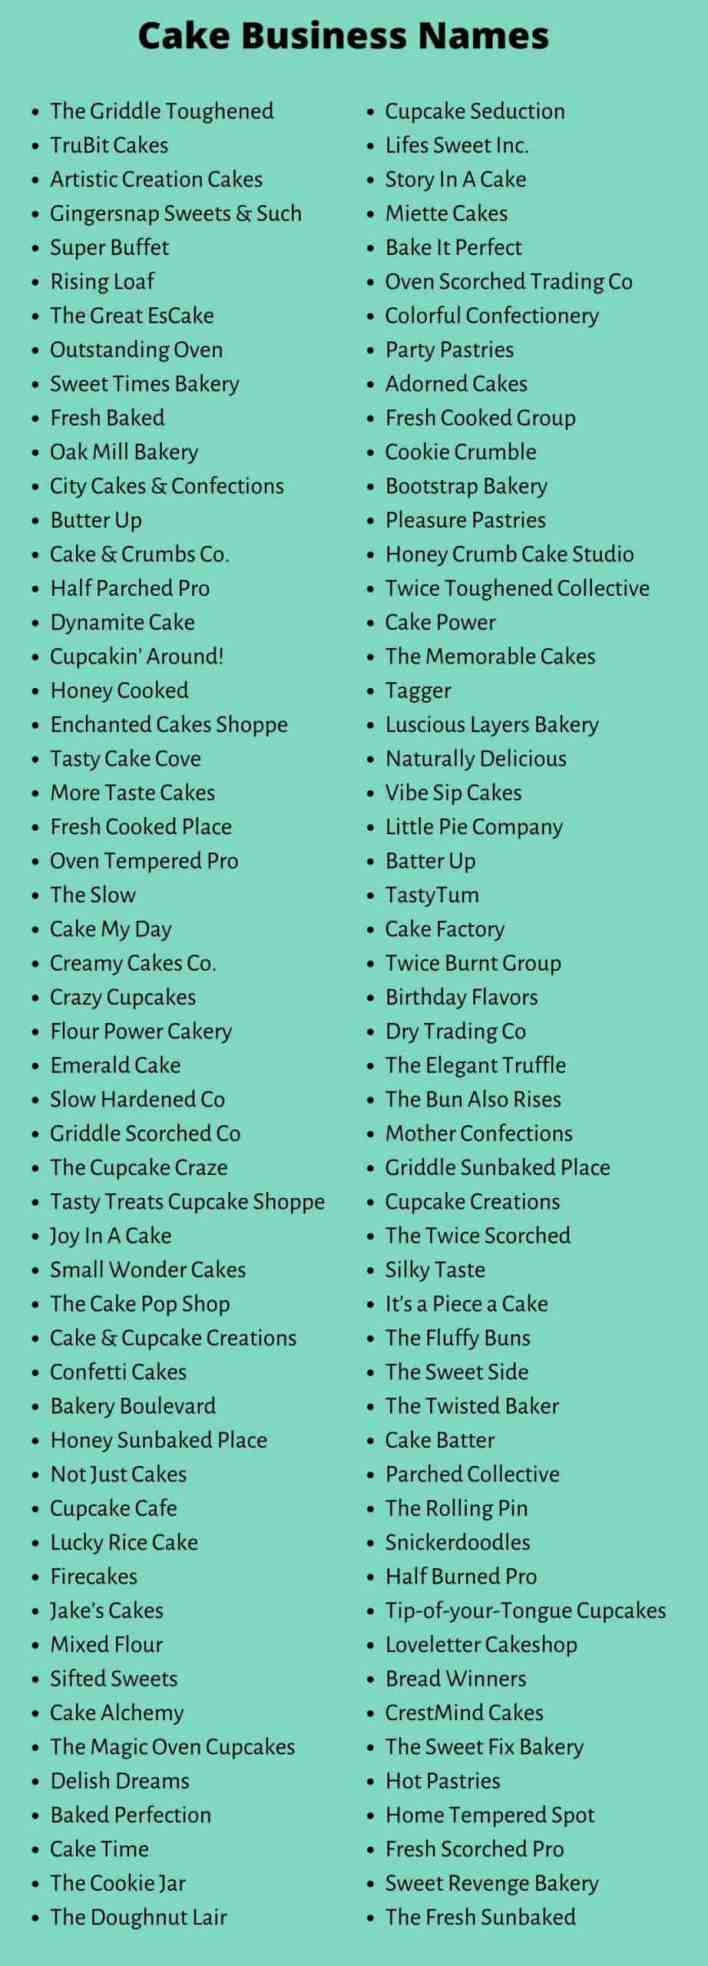 Cake Business Names